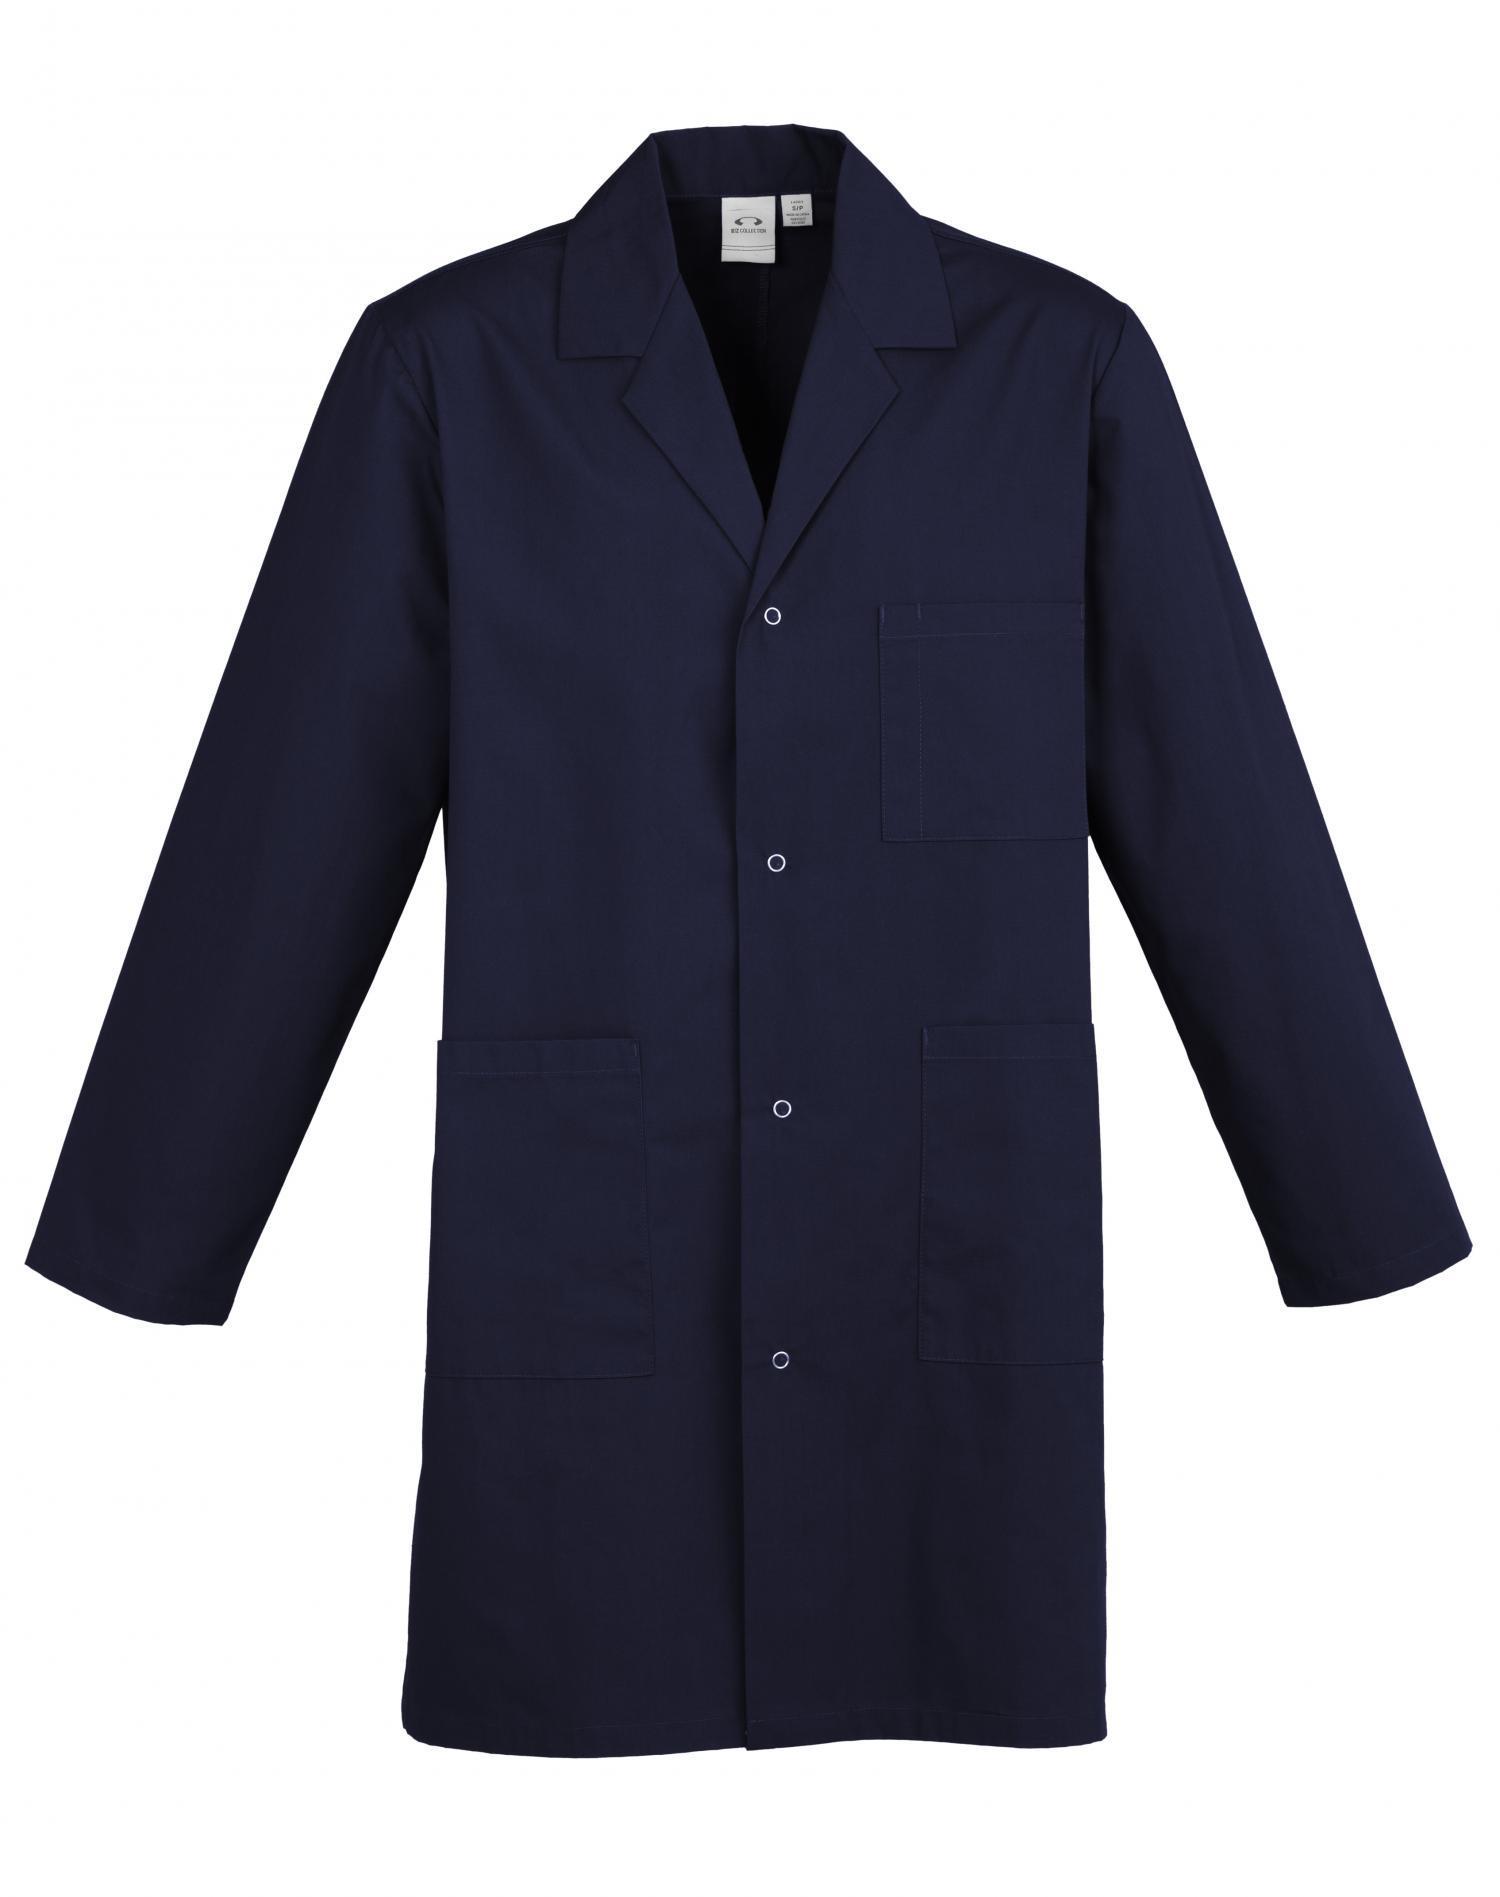 Classic lab coat healthcare the uniform factory for Spa uniform nz